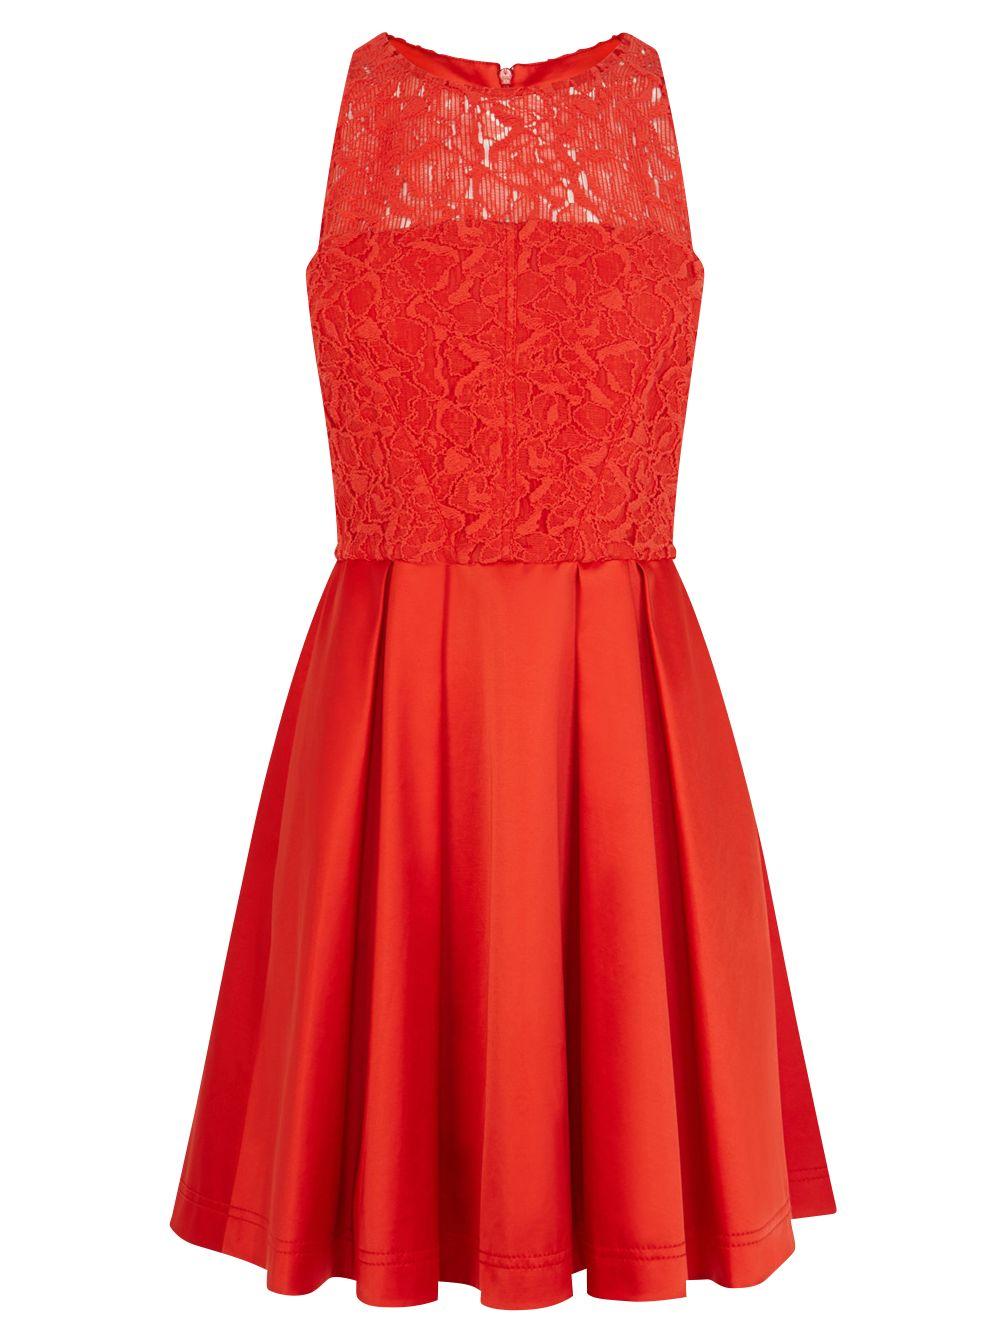 karen millen lace prom dress red, karen, millen, lace, prom, dress, red, karen millen, 14|8|10|12|16|6, women, womens dresses, gifts, wedding, wedding clothing, female guests, 1895099